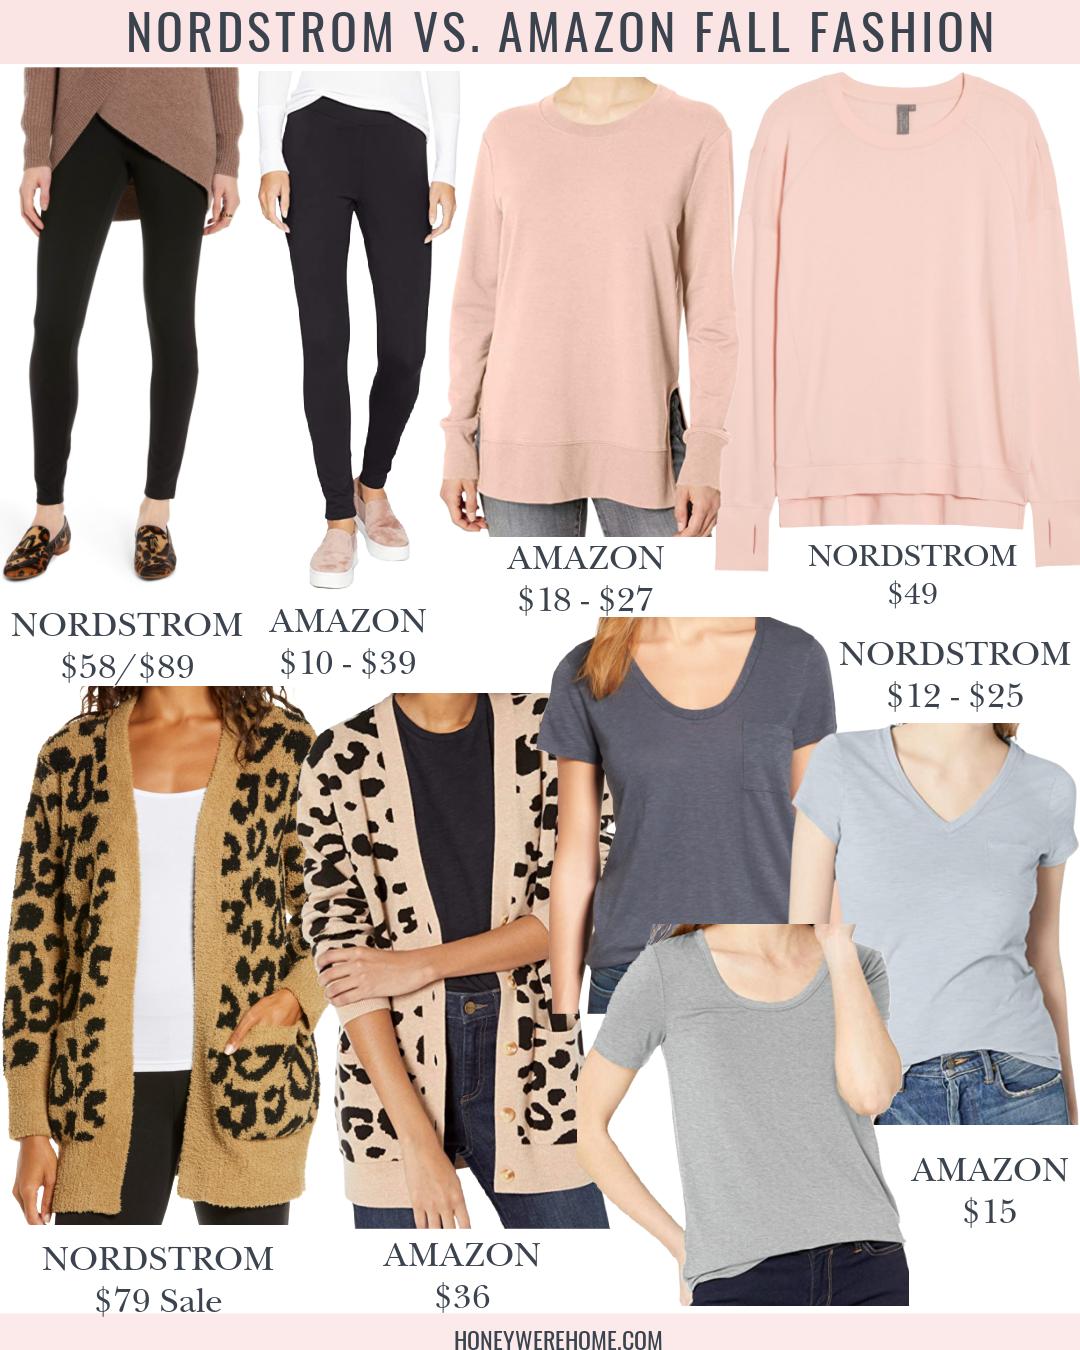 Nordstrom v. Amazon Fall Fashion